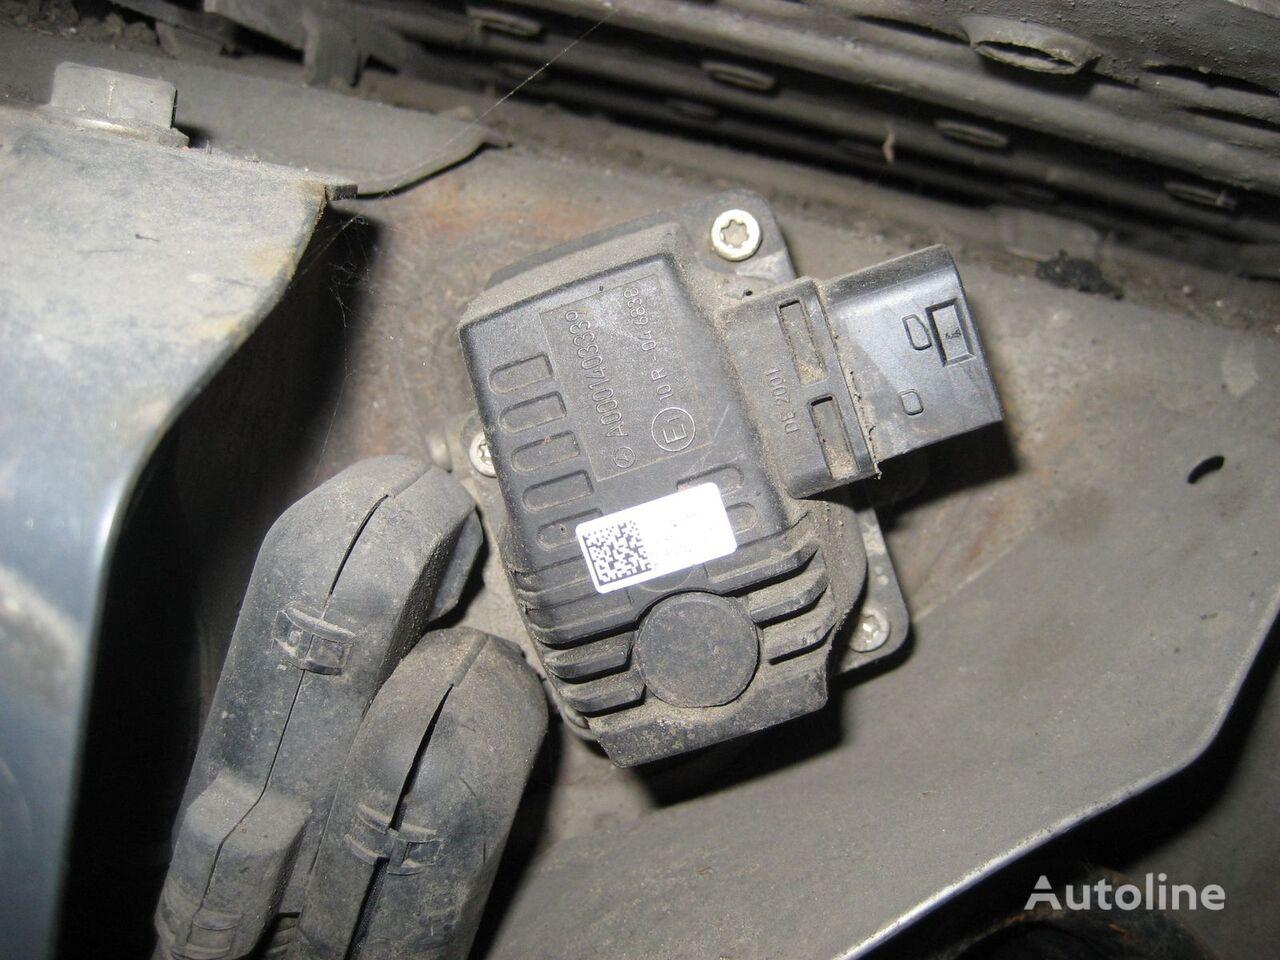 MERCEDES-BENZ Actros MP4 EURO5, EURO6, AD BLUE metering unit, nox sensor befor AdBlue tank for MERCEDES-BENZ Actros MP4 tractor unit